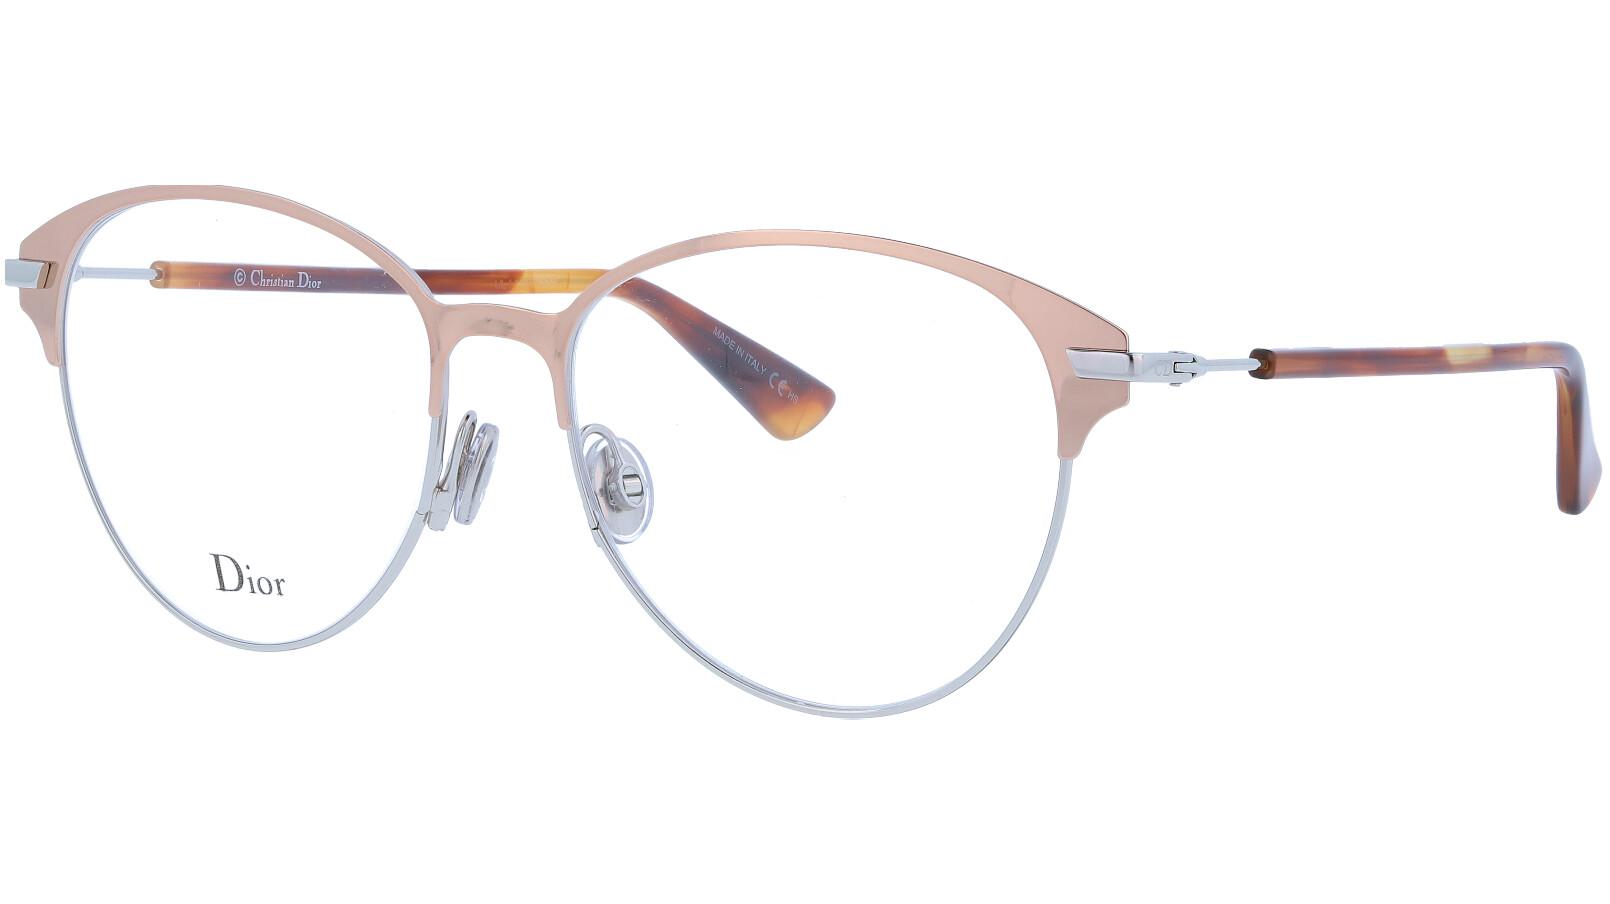 DIOR DIORESSENCE14 I20 53 ROSEGOLD Glasses